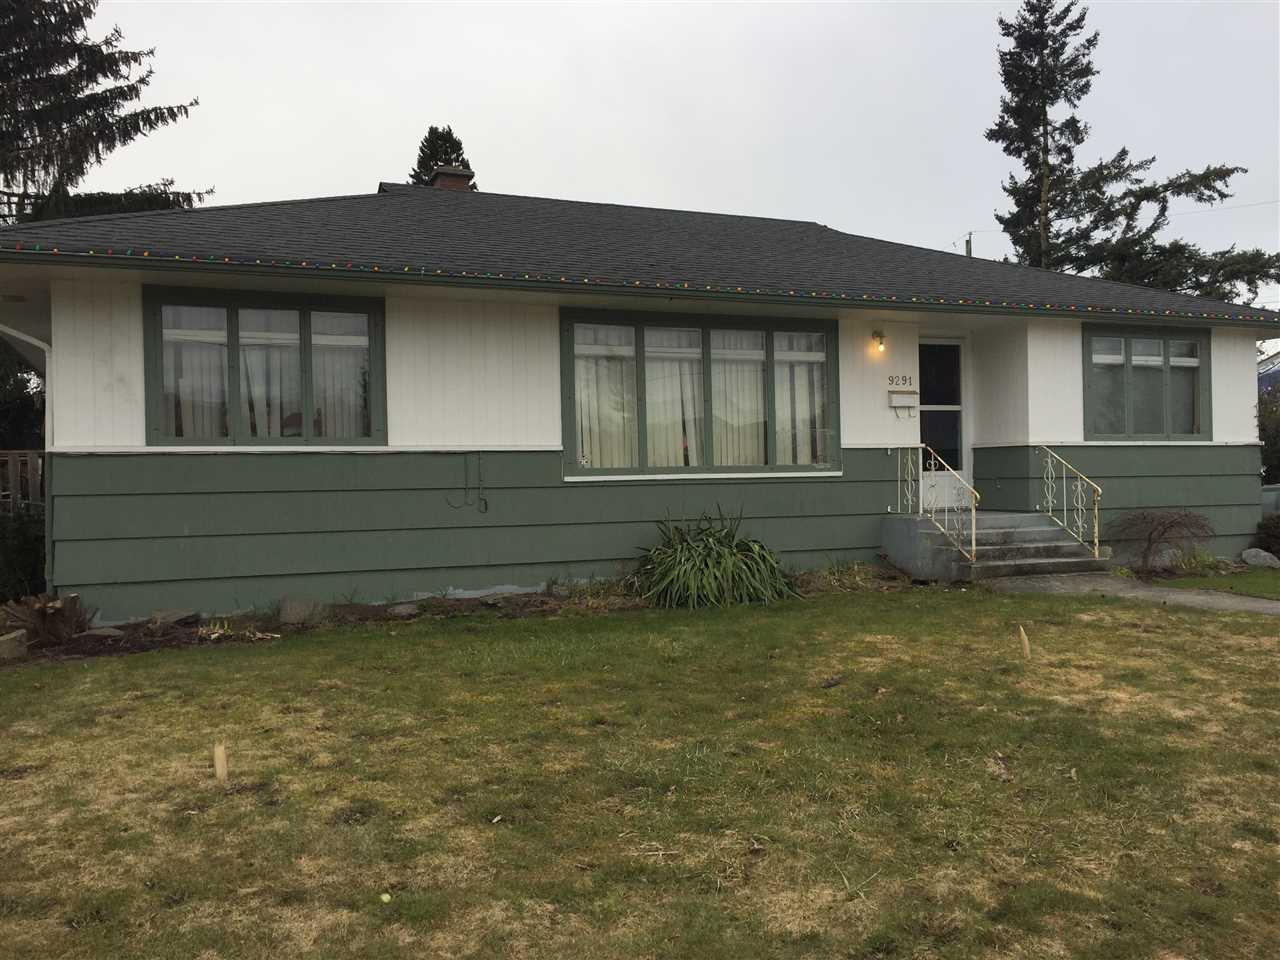 Detached at 9291 BROADWAY STREET, Chilliwack, British Columbia. Image 1